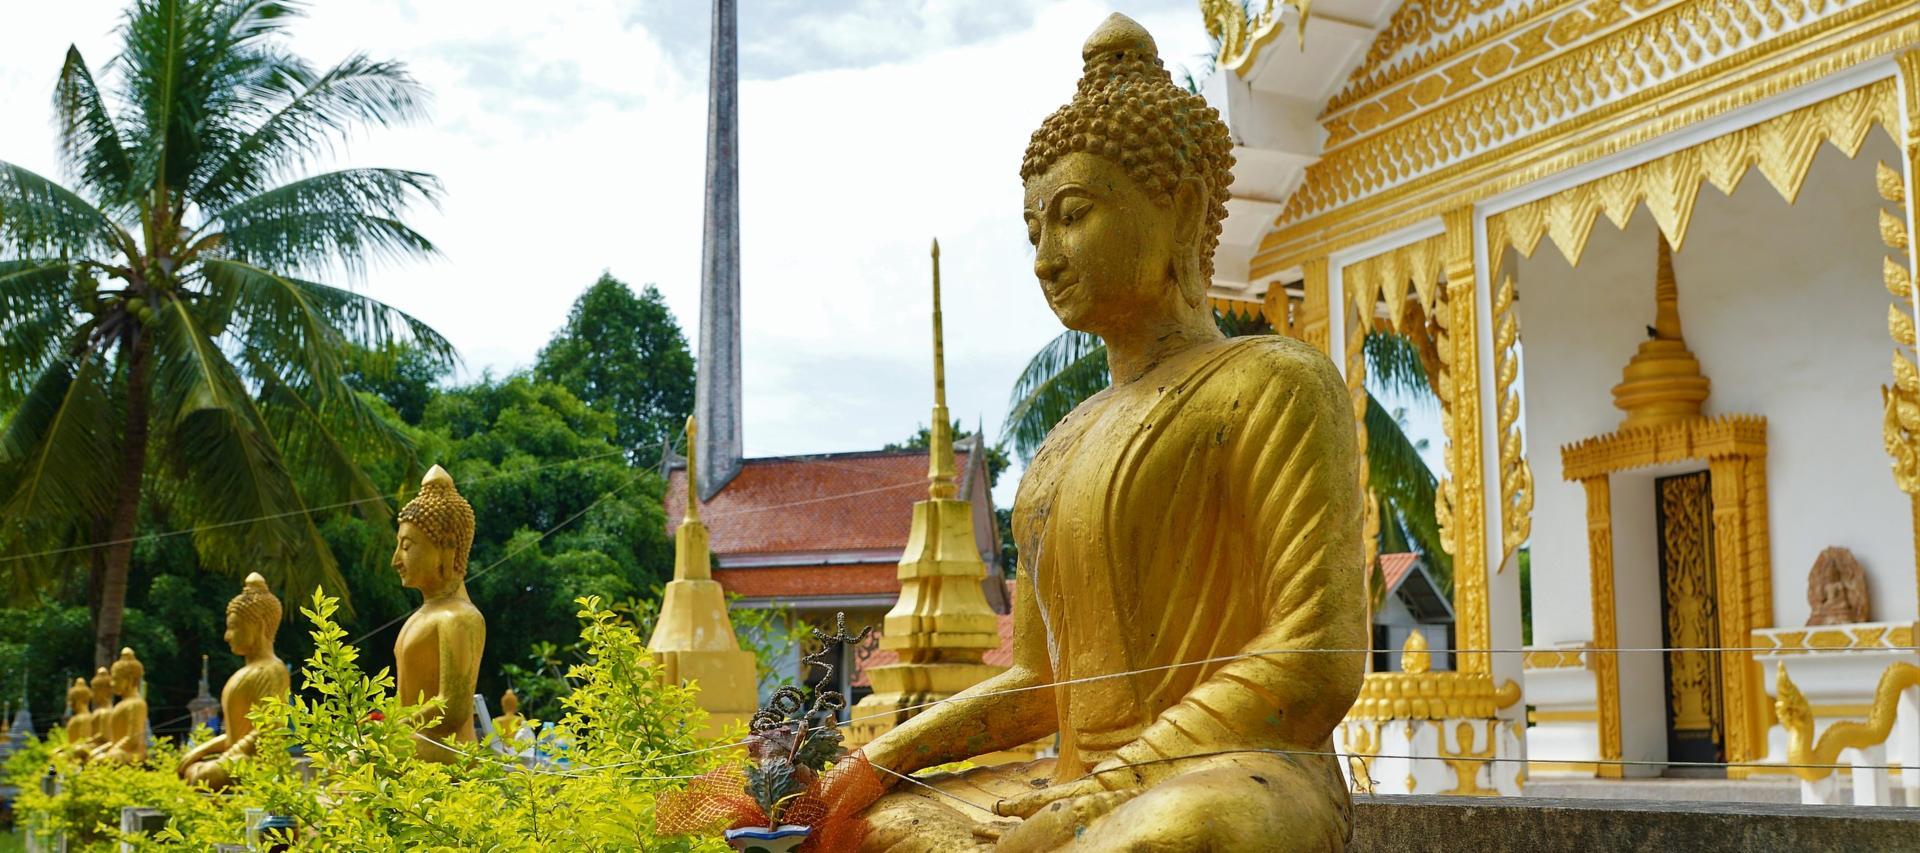 Buddhas in Koh Samui